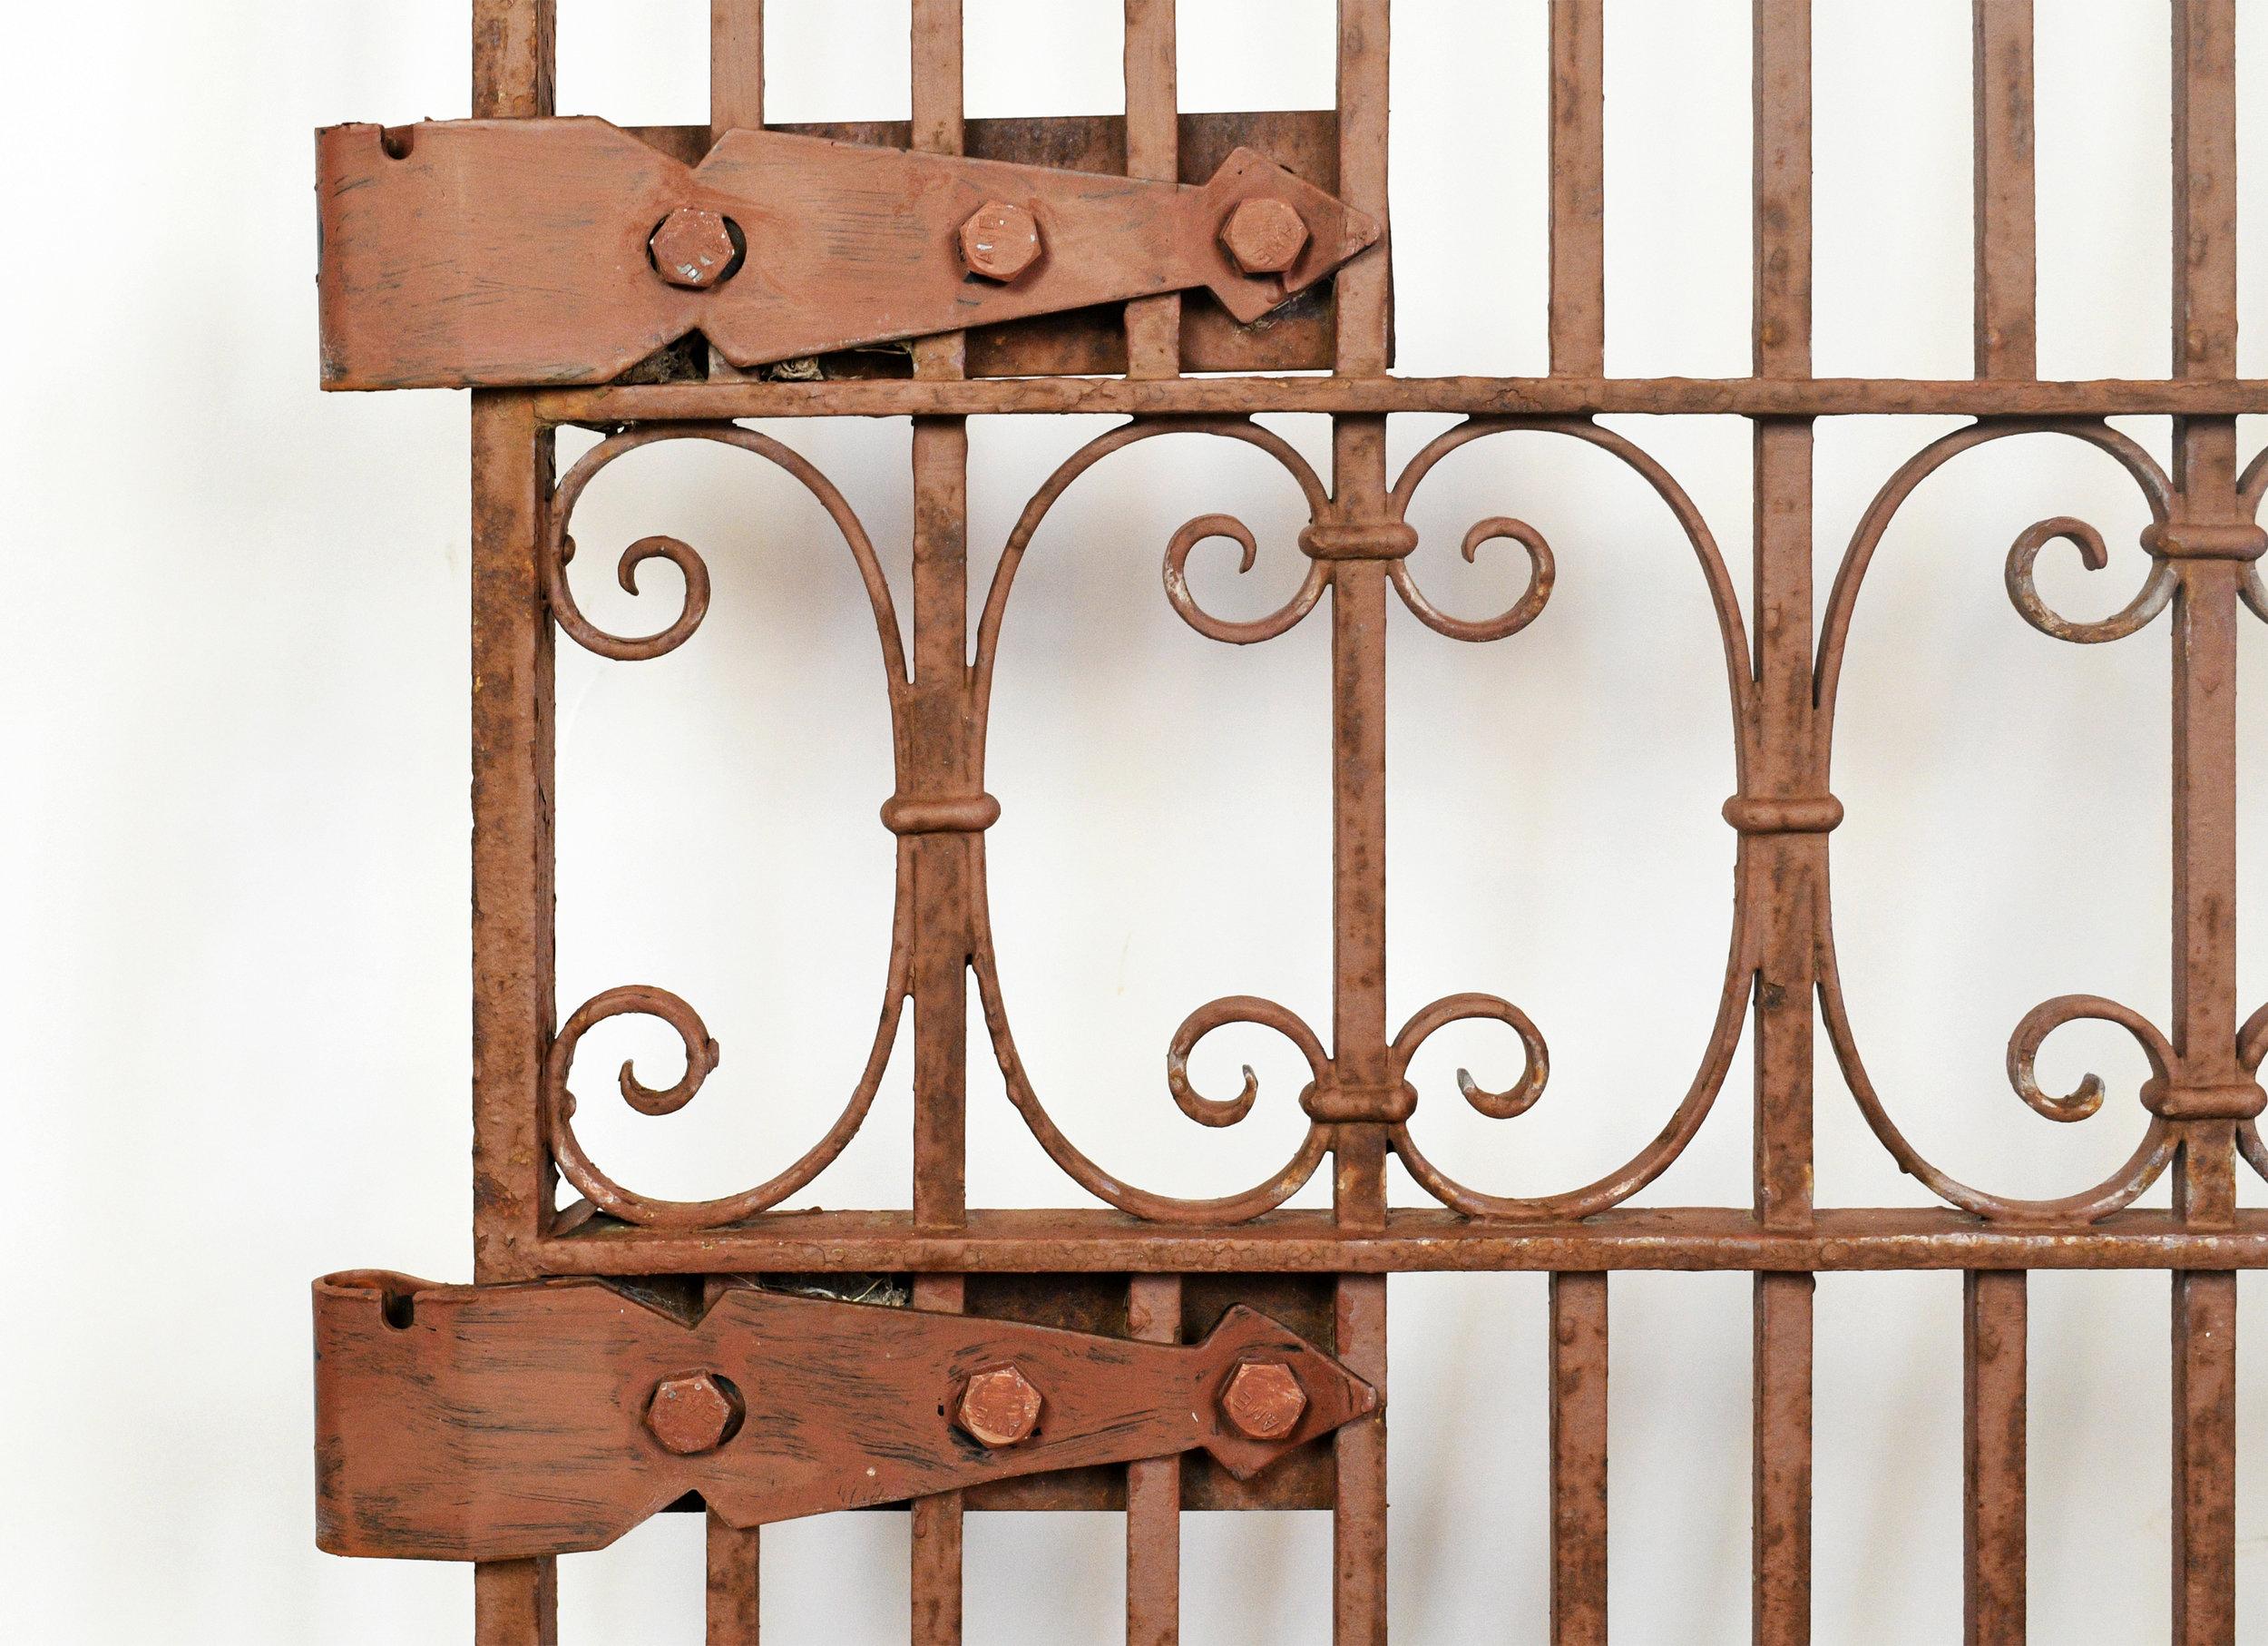 47805-iron-gate-6.jpg